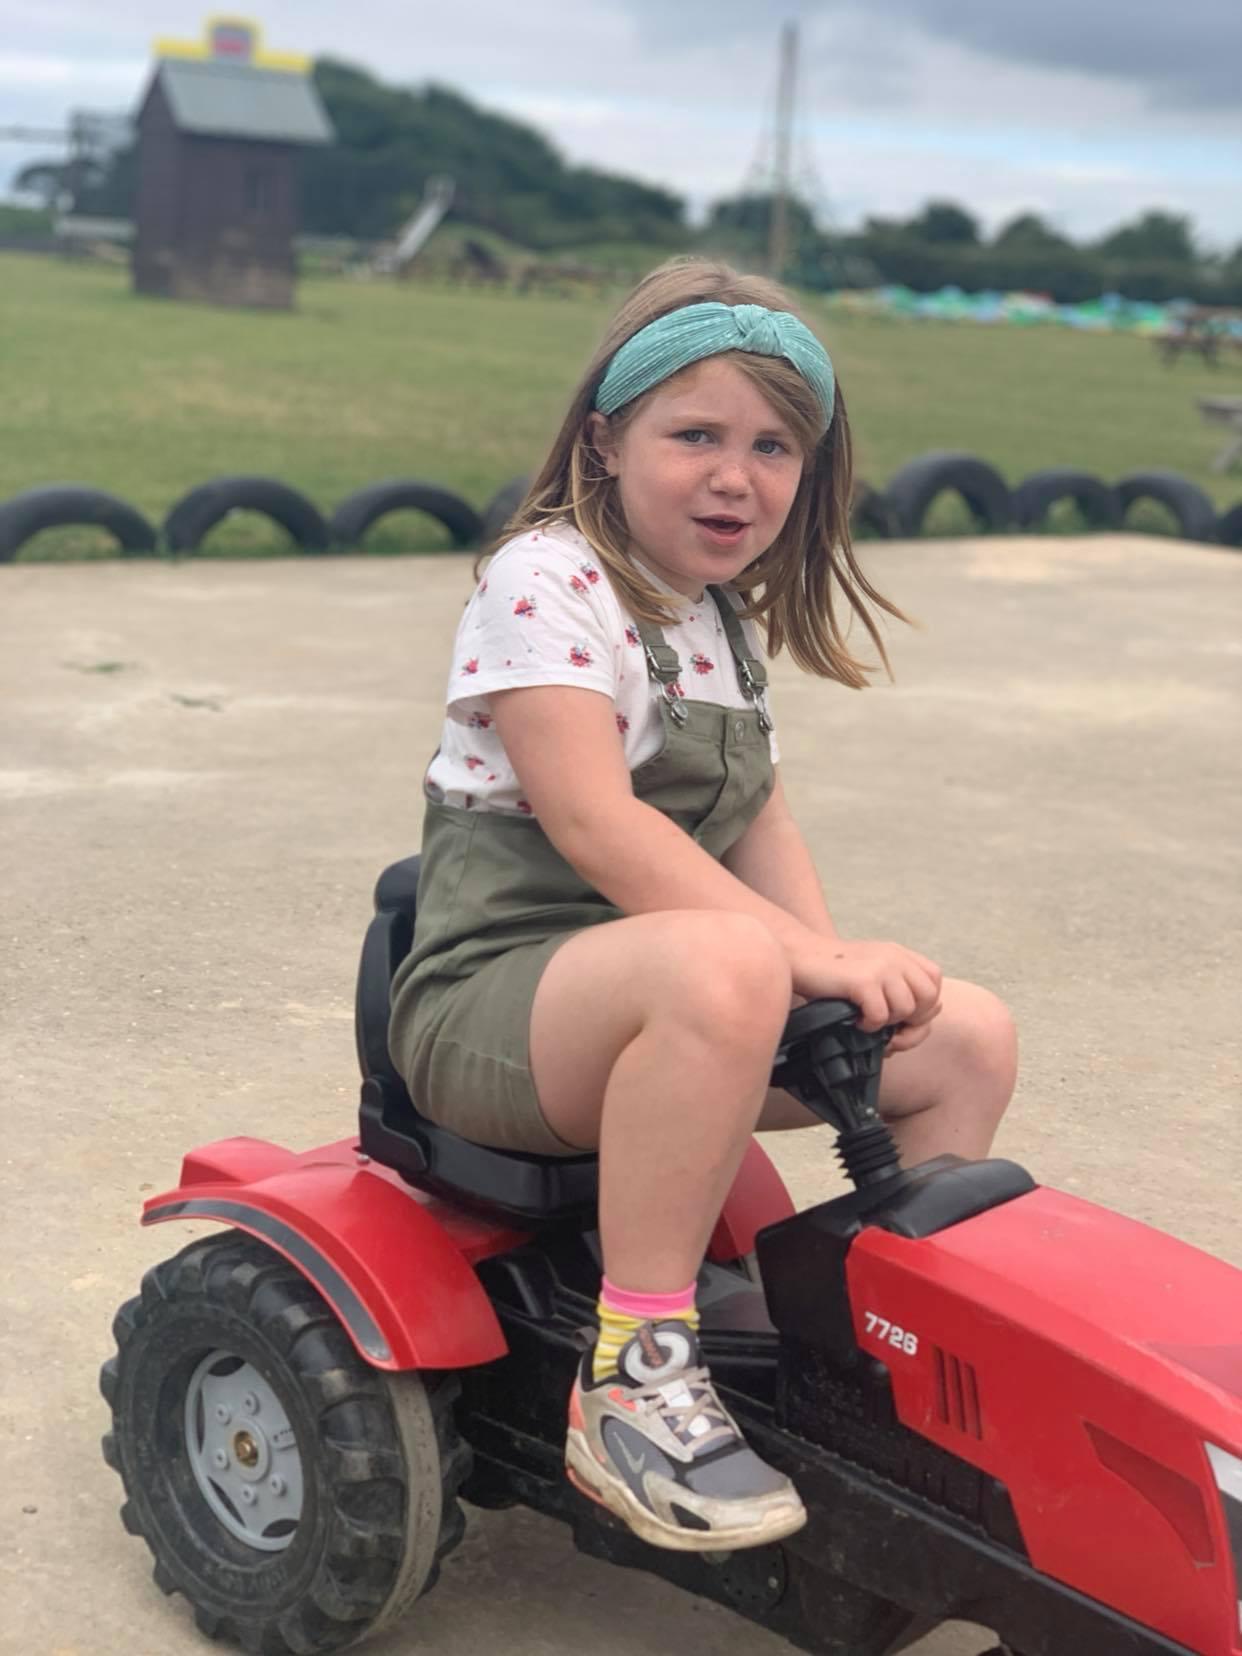 Hirstys family fun park hemsby, ride along tractors, a suffolk mum blog review